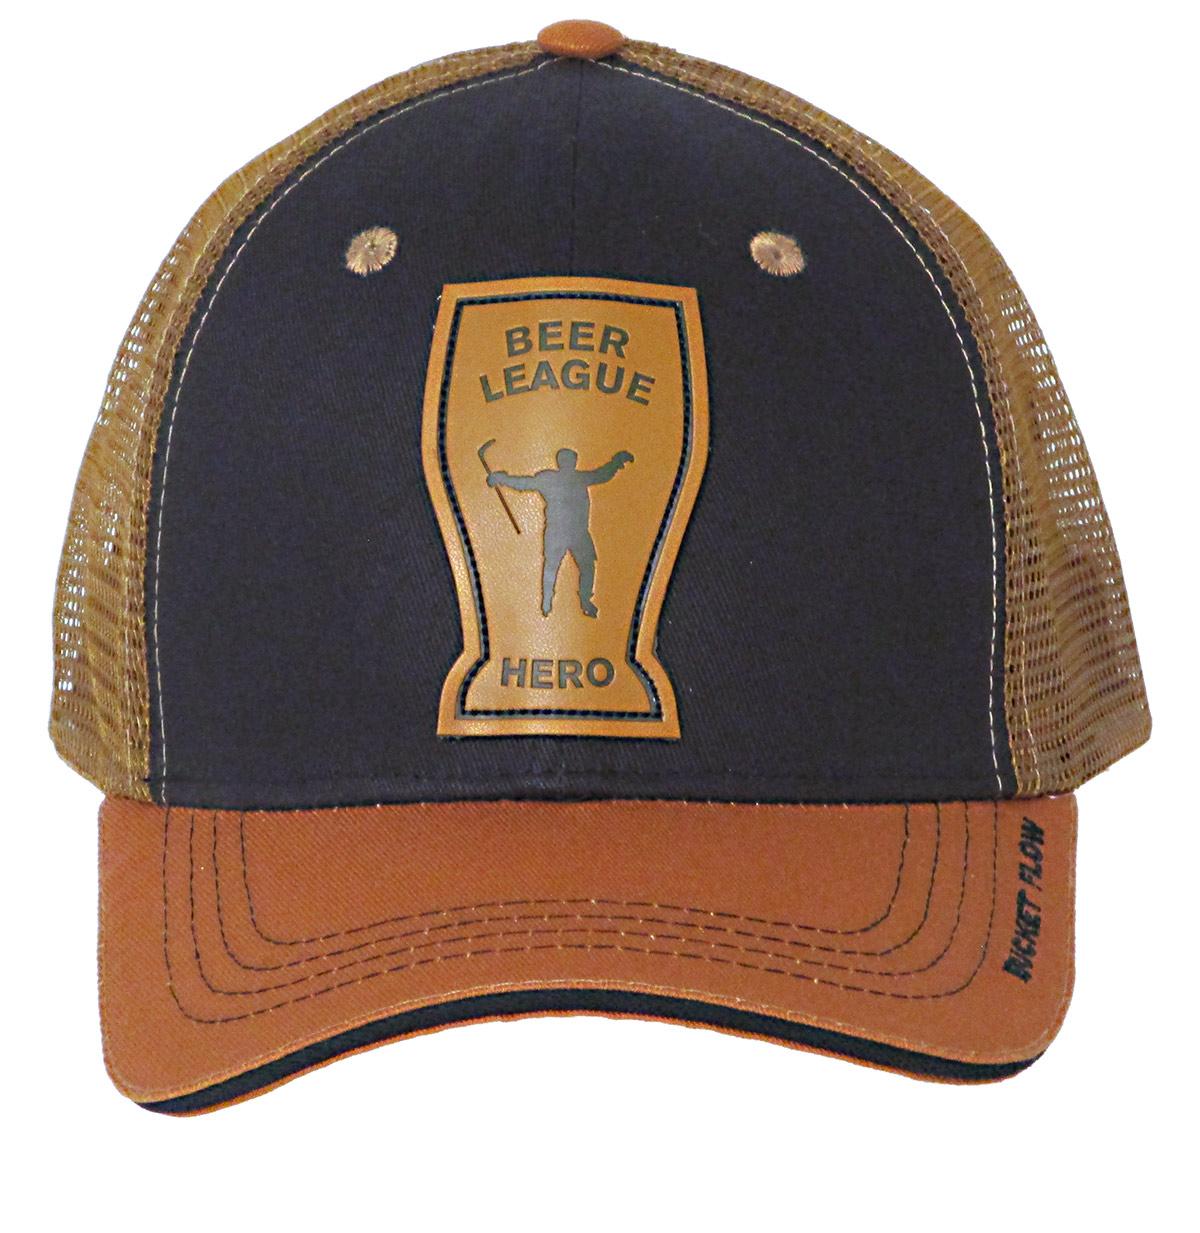 Beer League Hero